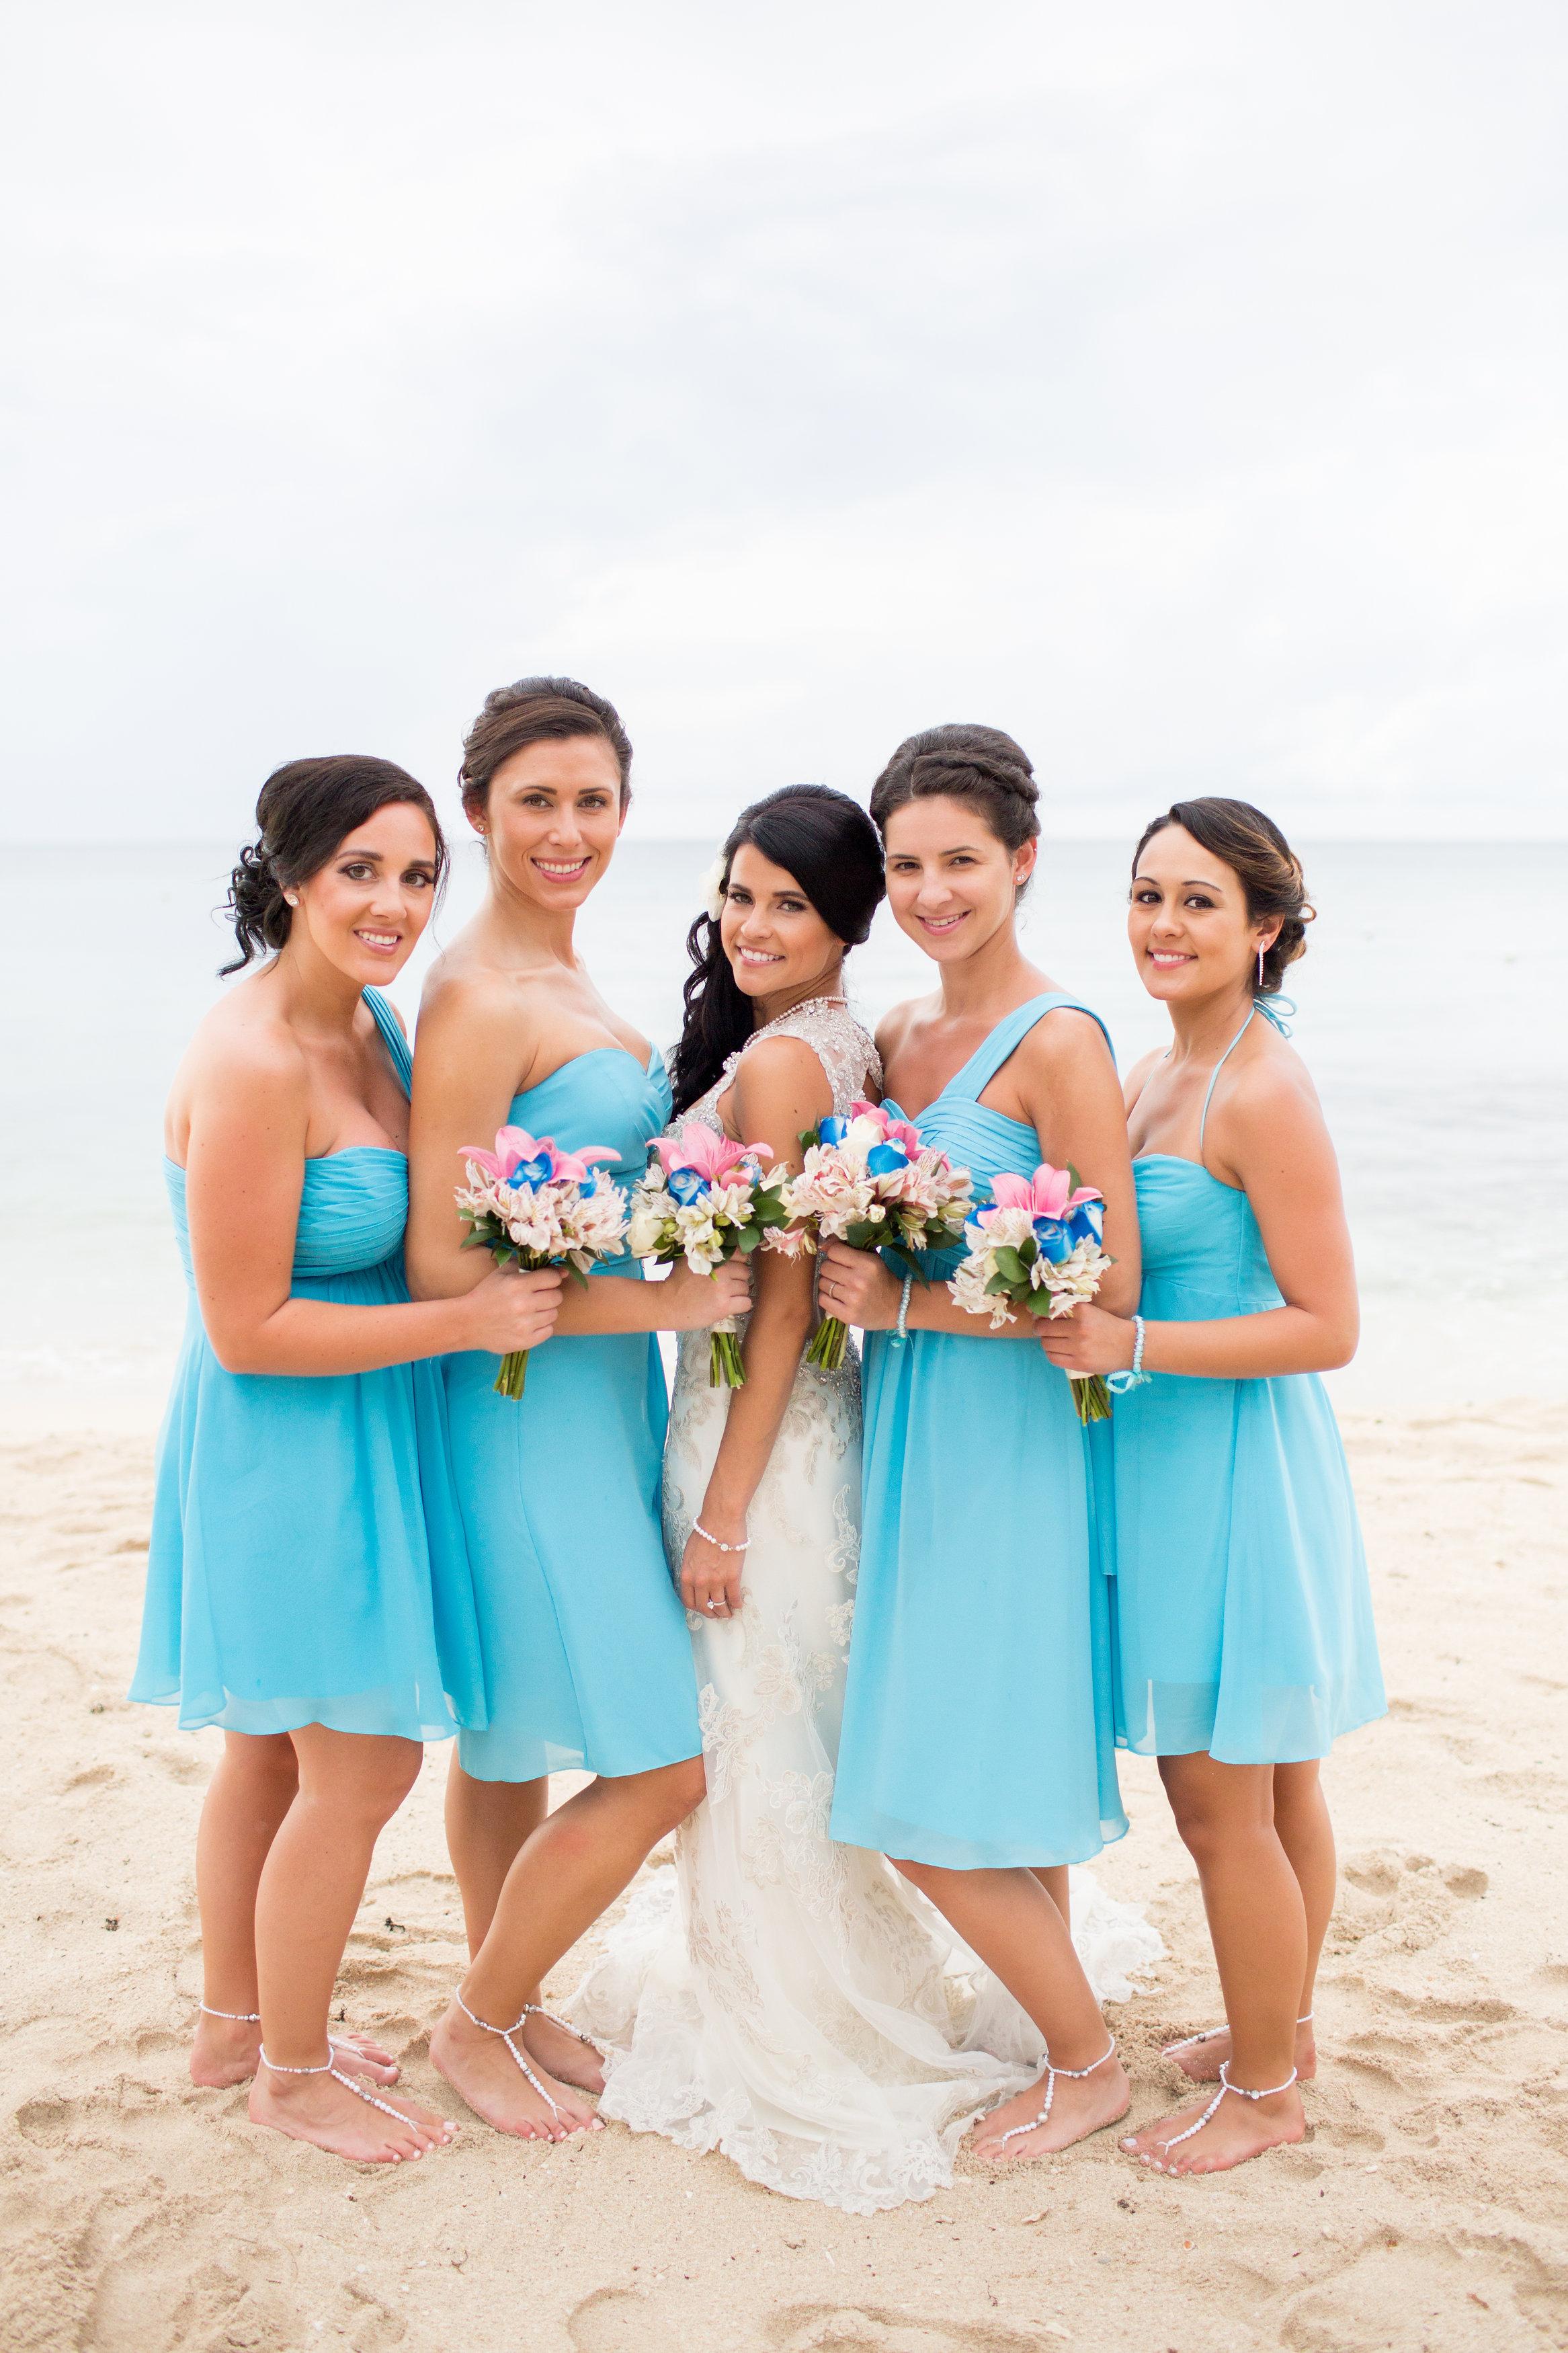 Azazie Jessica Bridesmaid Dress | Azazie